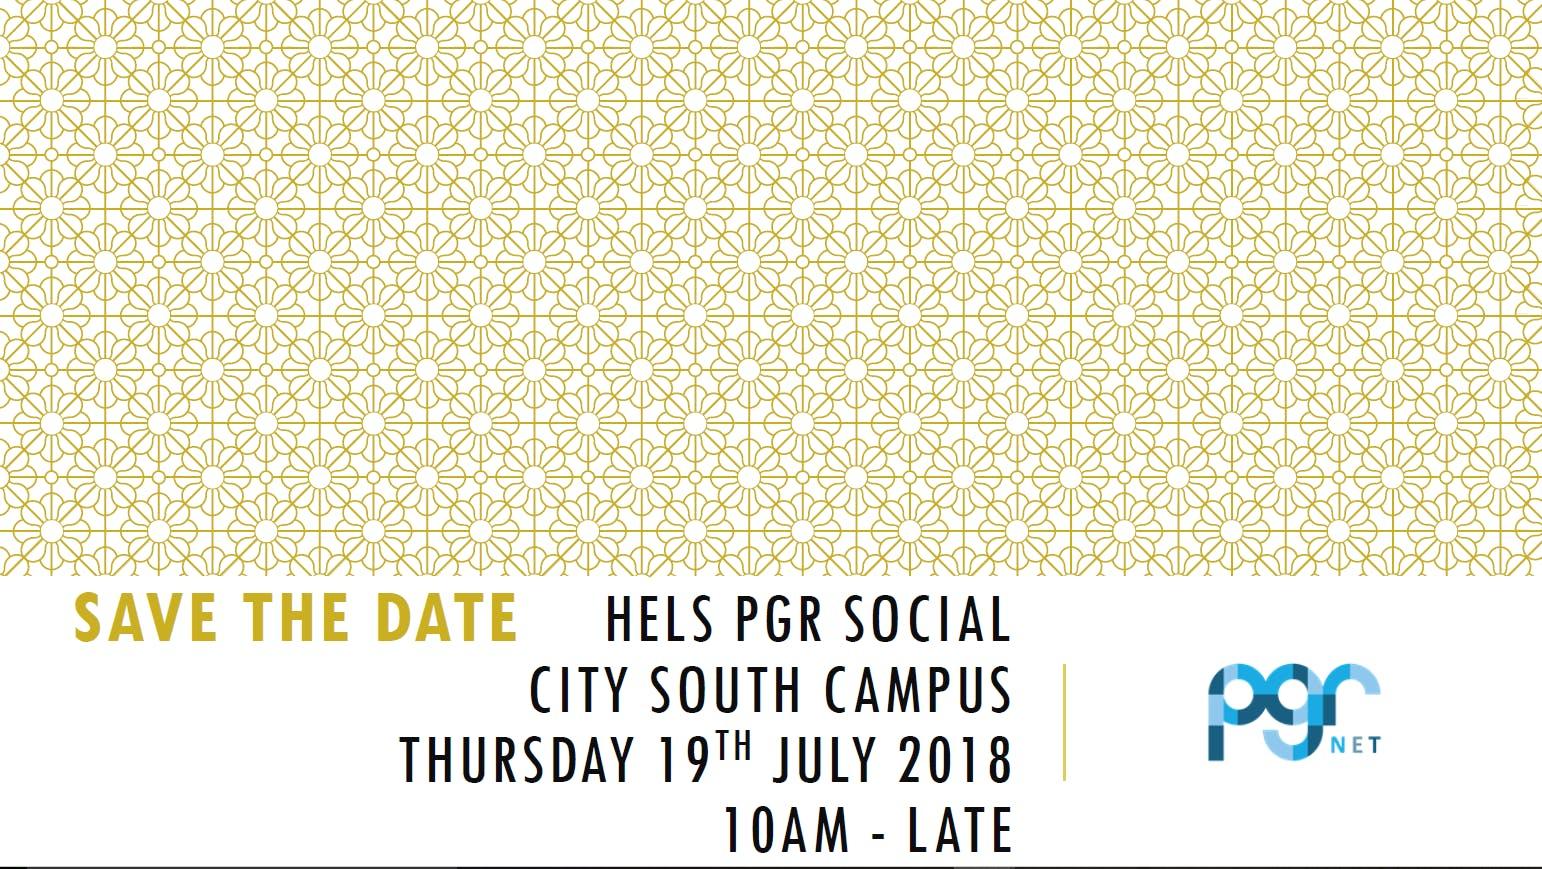 HELS PGR Social, 19 July 2018